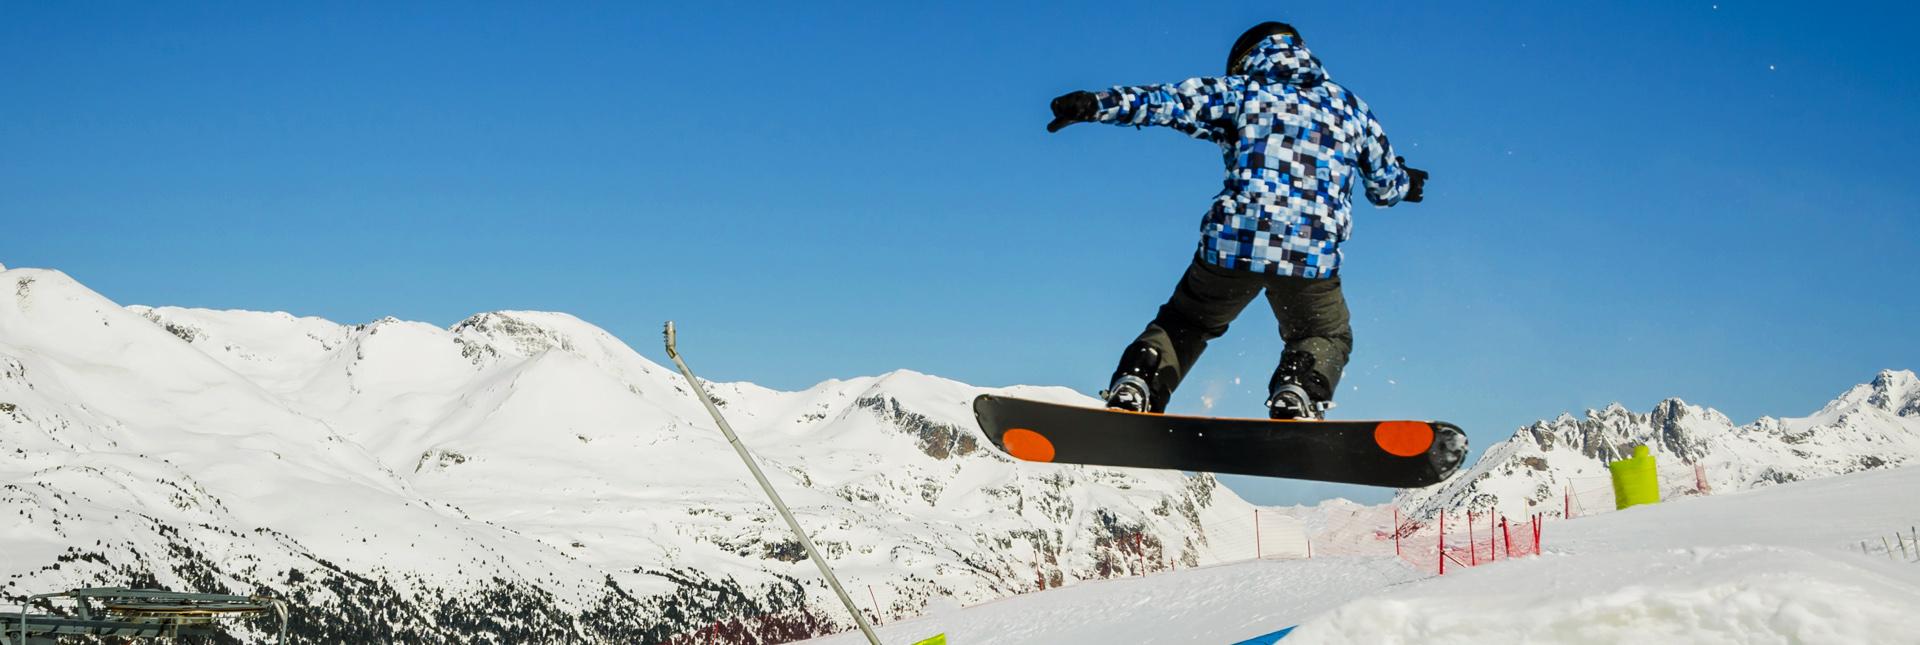 Snowboarding on the slopes around Zermatt